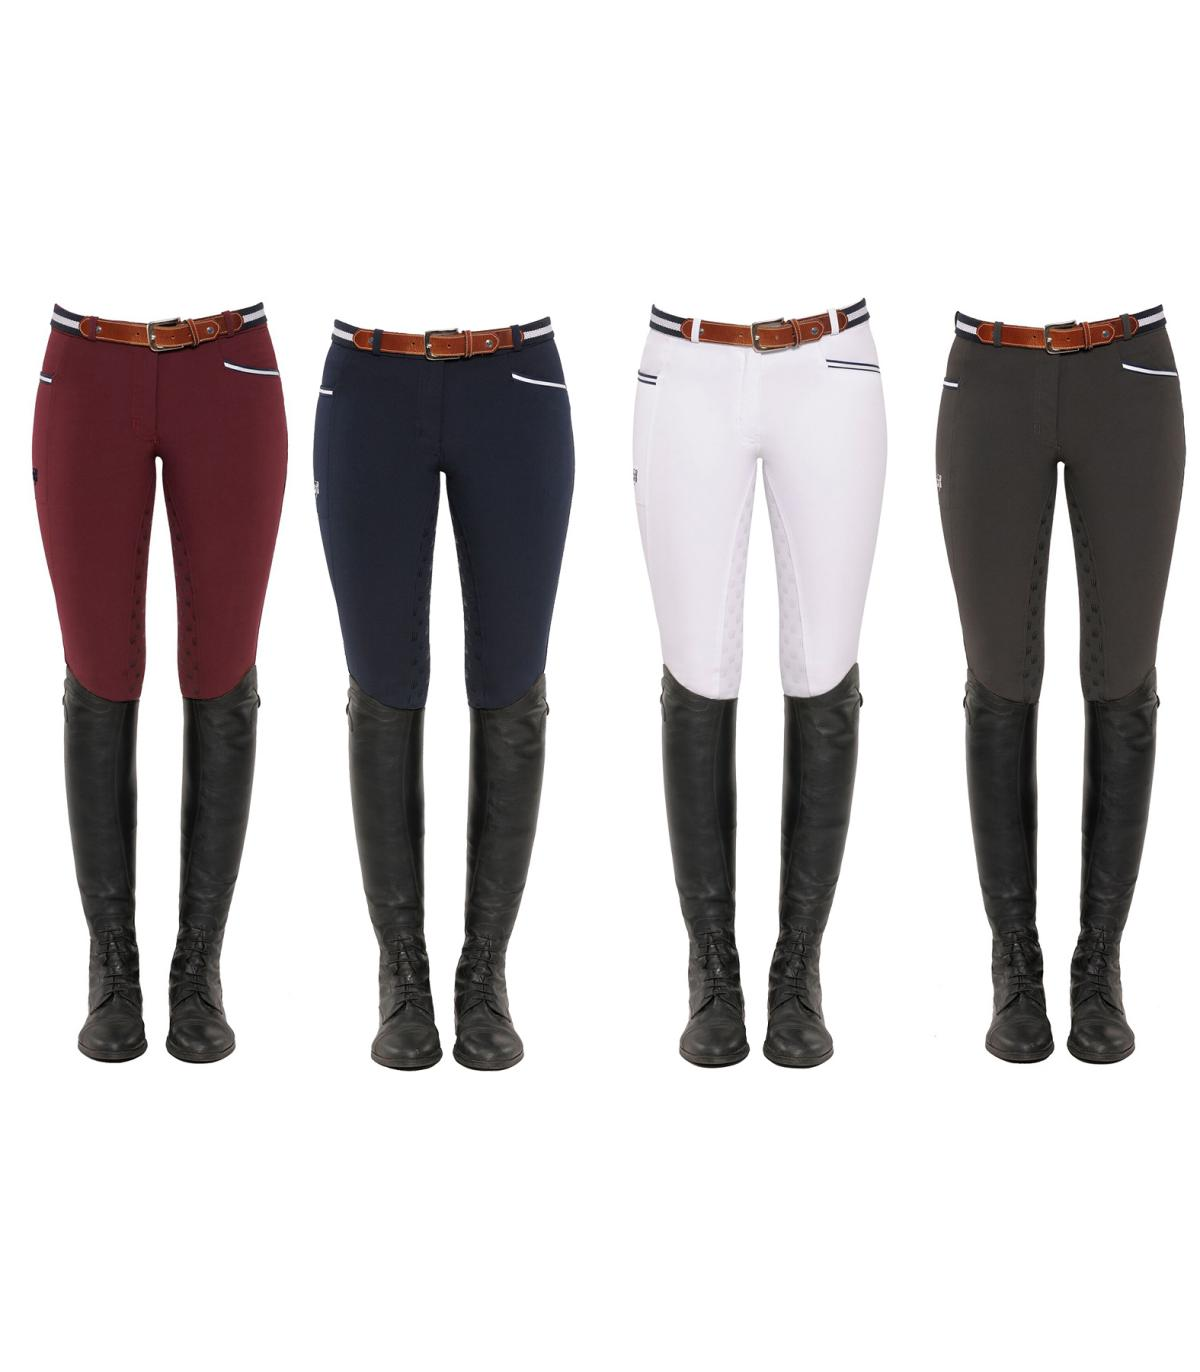 Full Couleur Grip Leena Pantalon Spooks Bordeaux Taille Xl A453RjLq